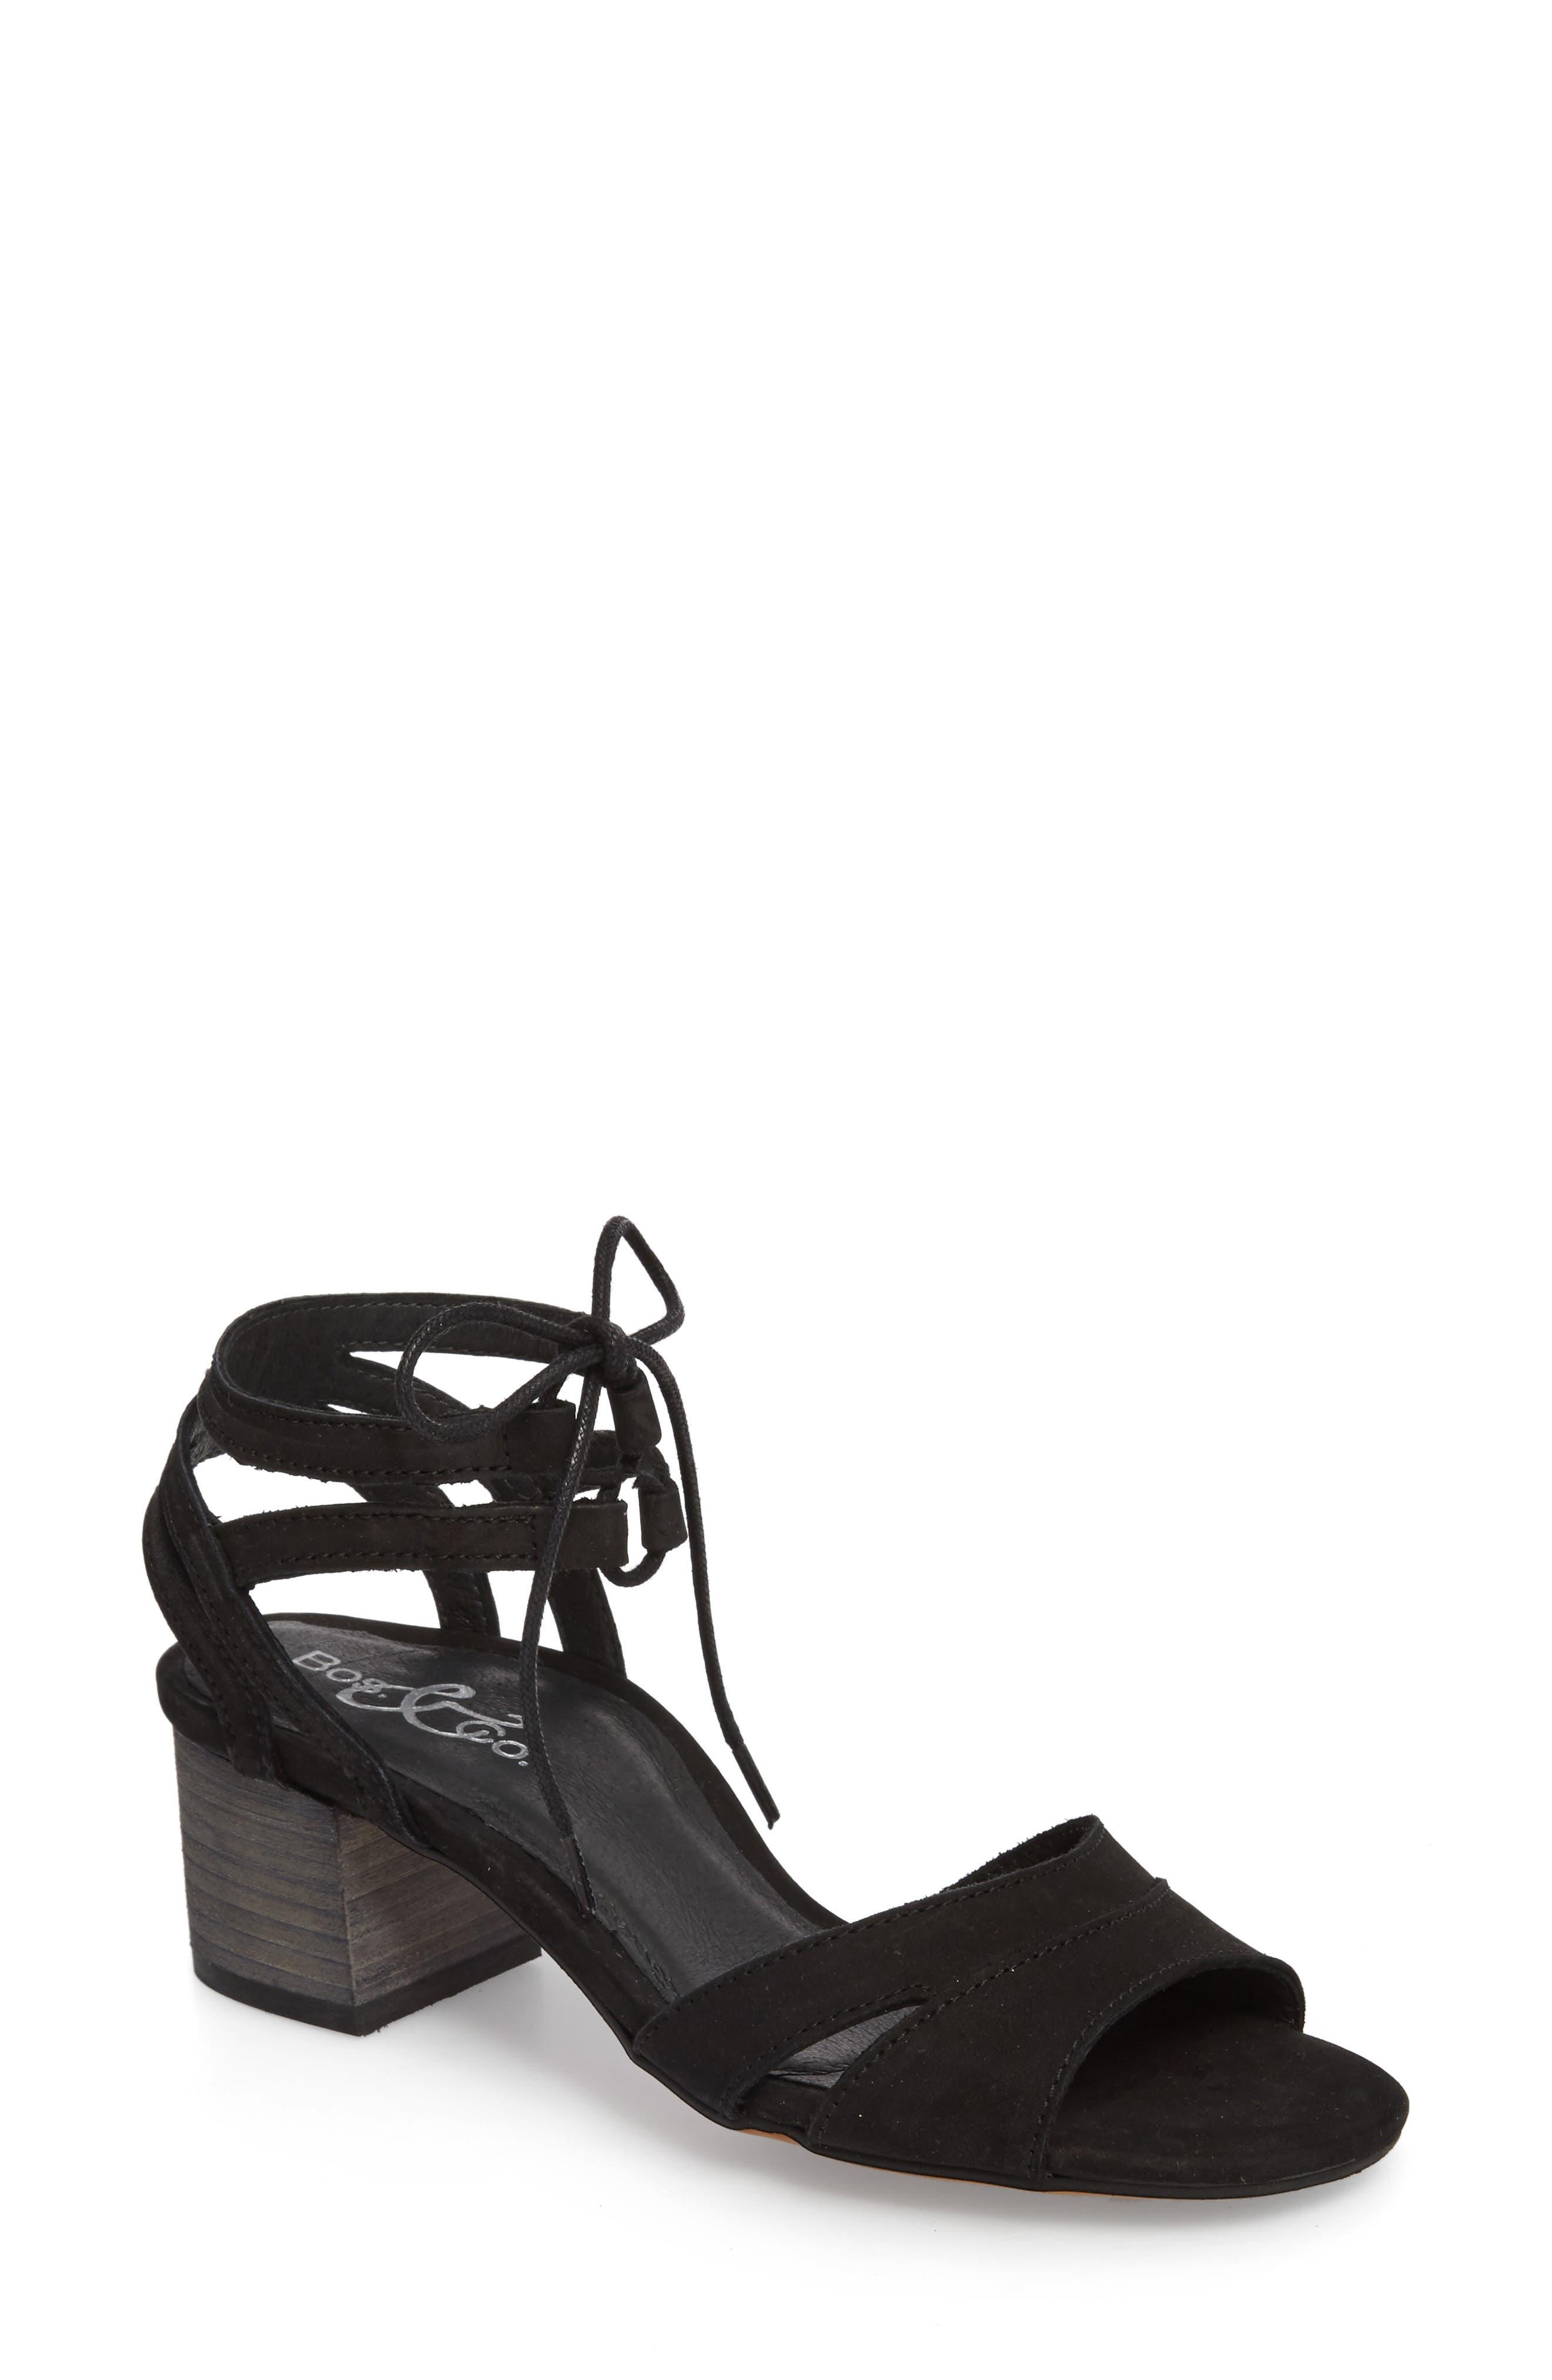 Zorita Sandal,                         Main,                         color, Black Nubuck Leather